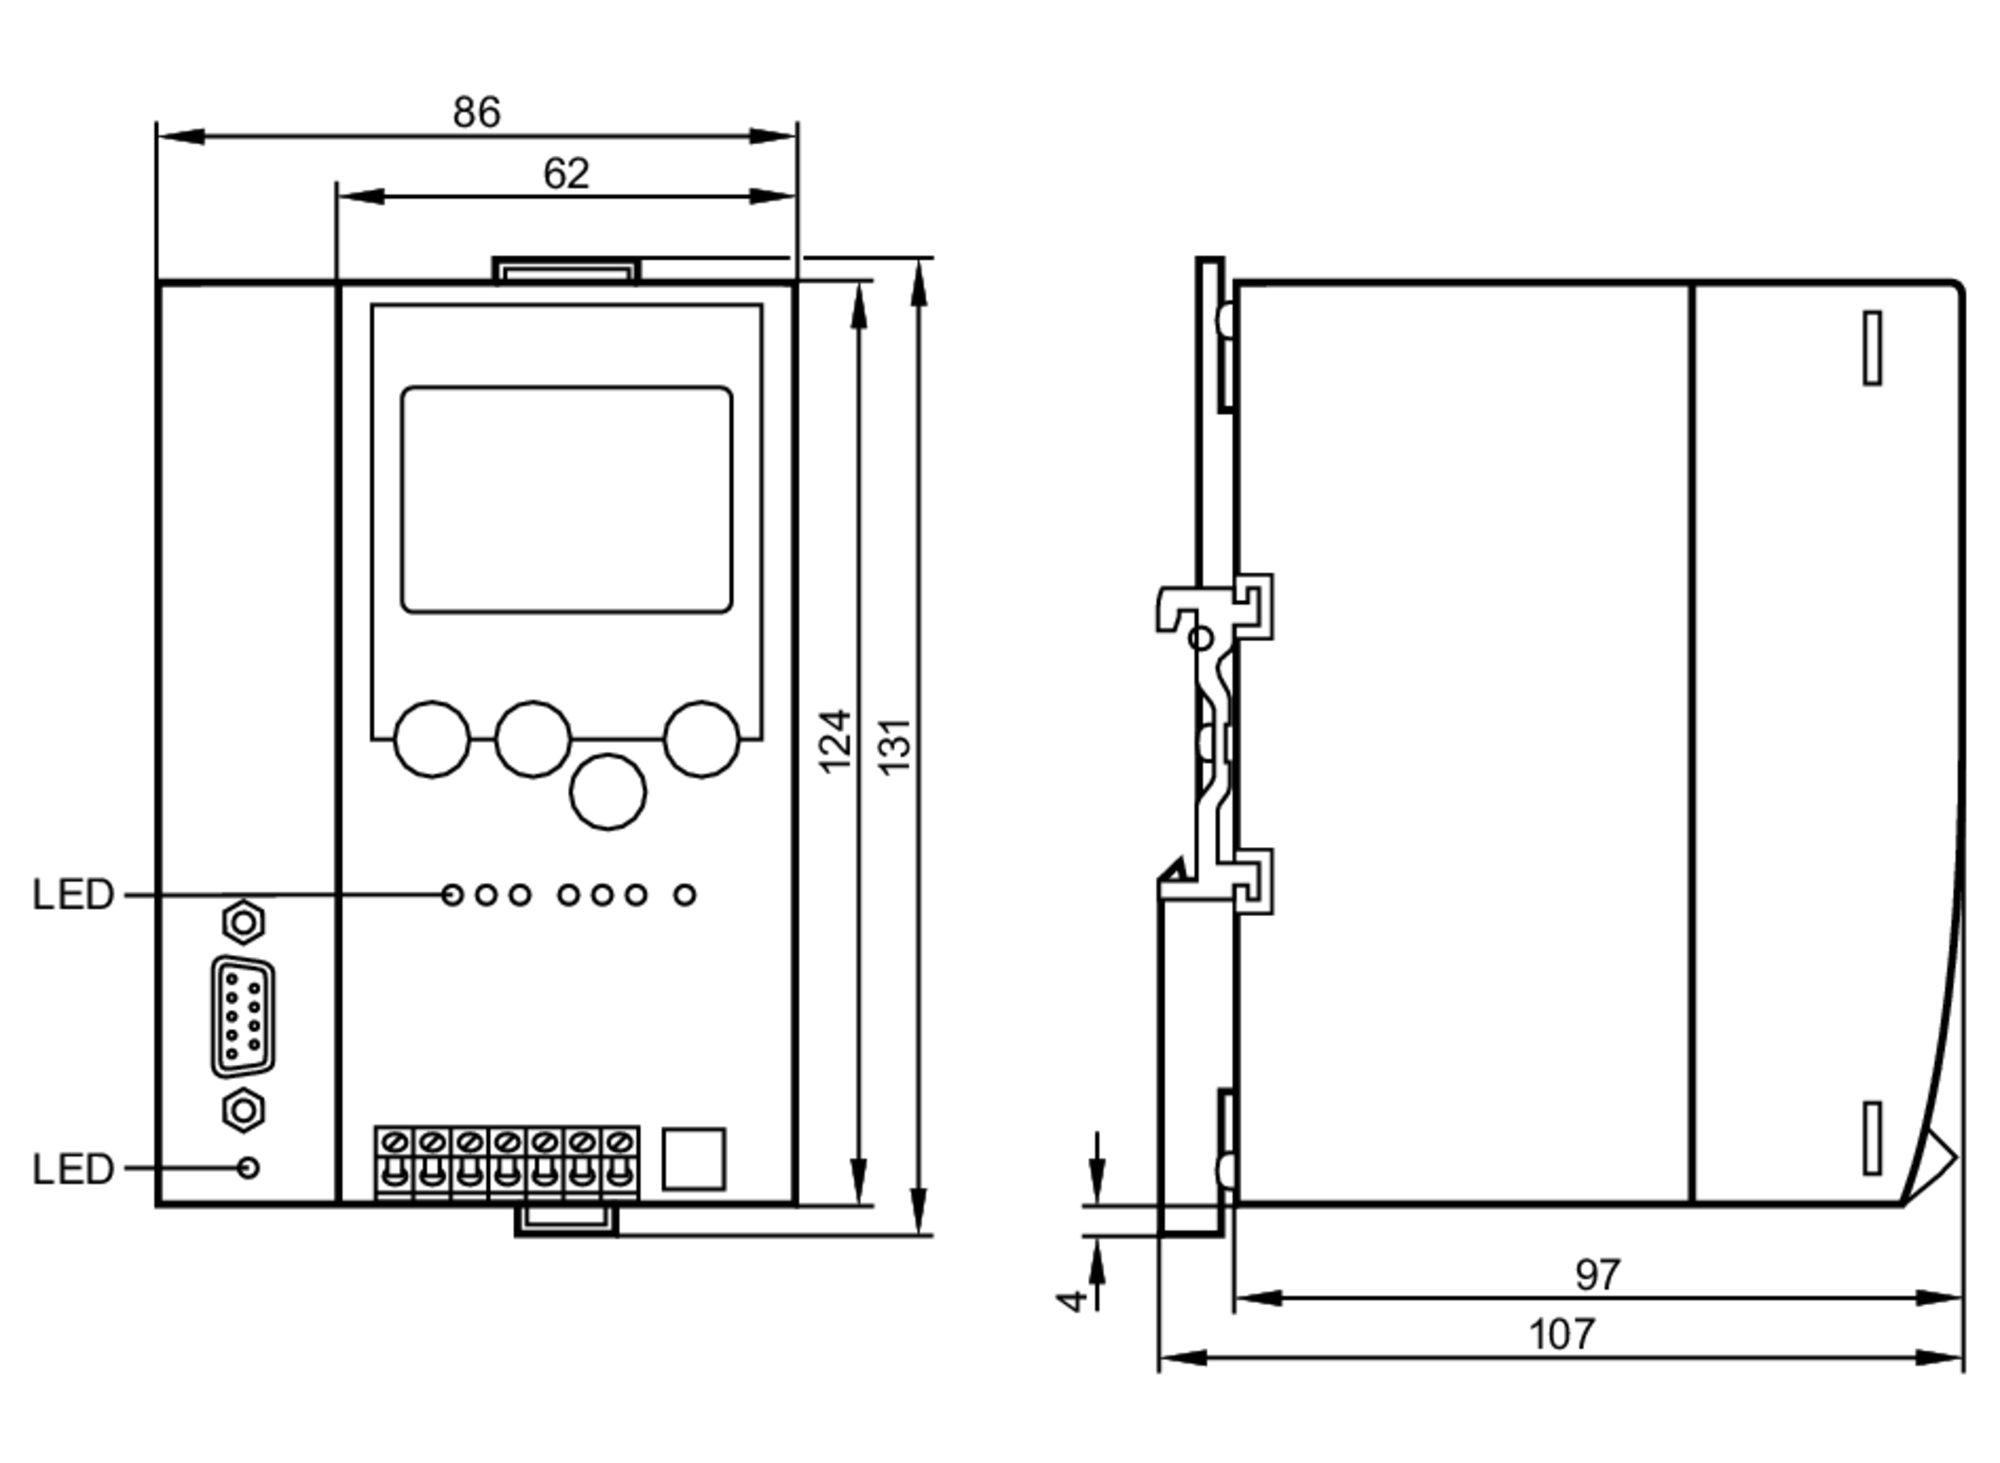 cu240e 2 wiring diagram genie garage door openers profibus dp library scale drawing